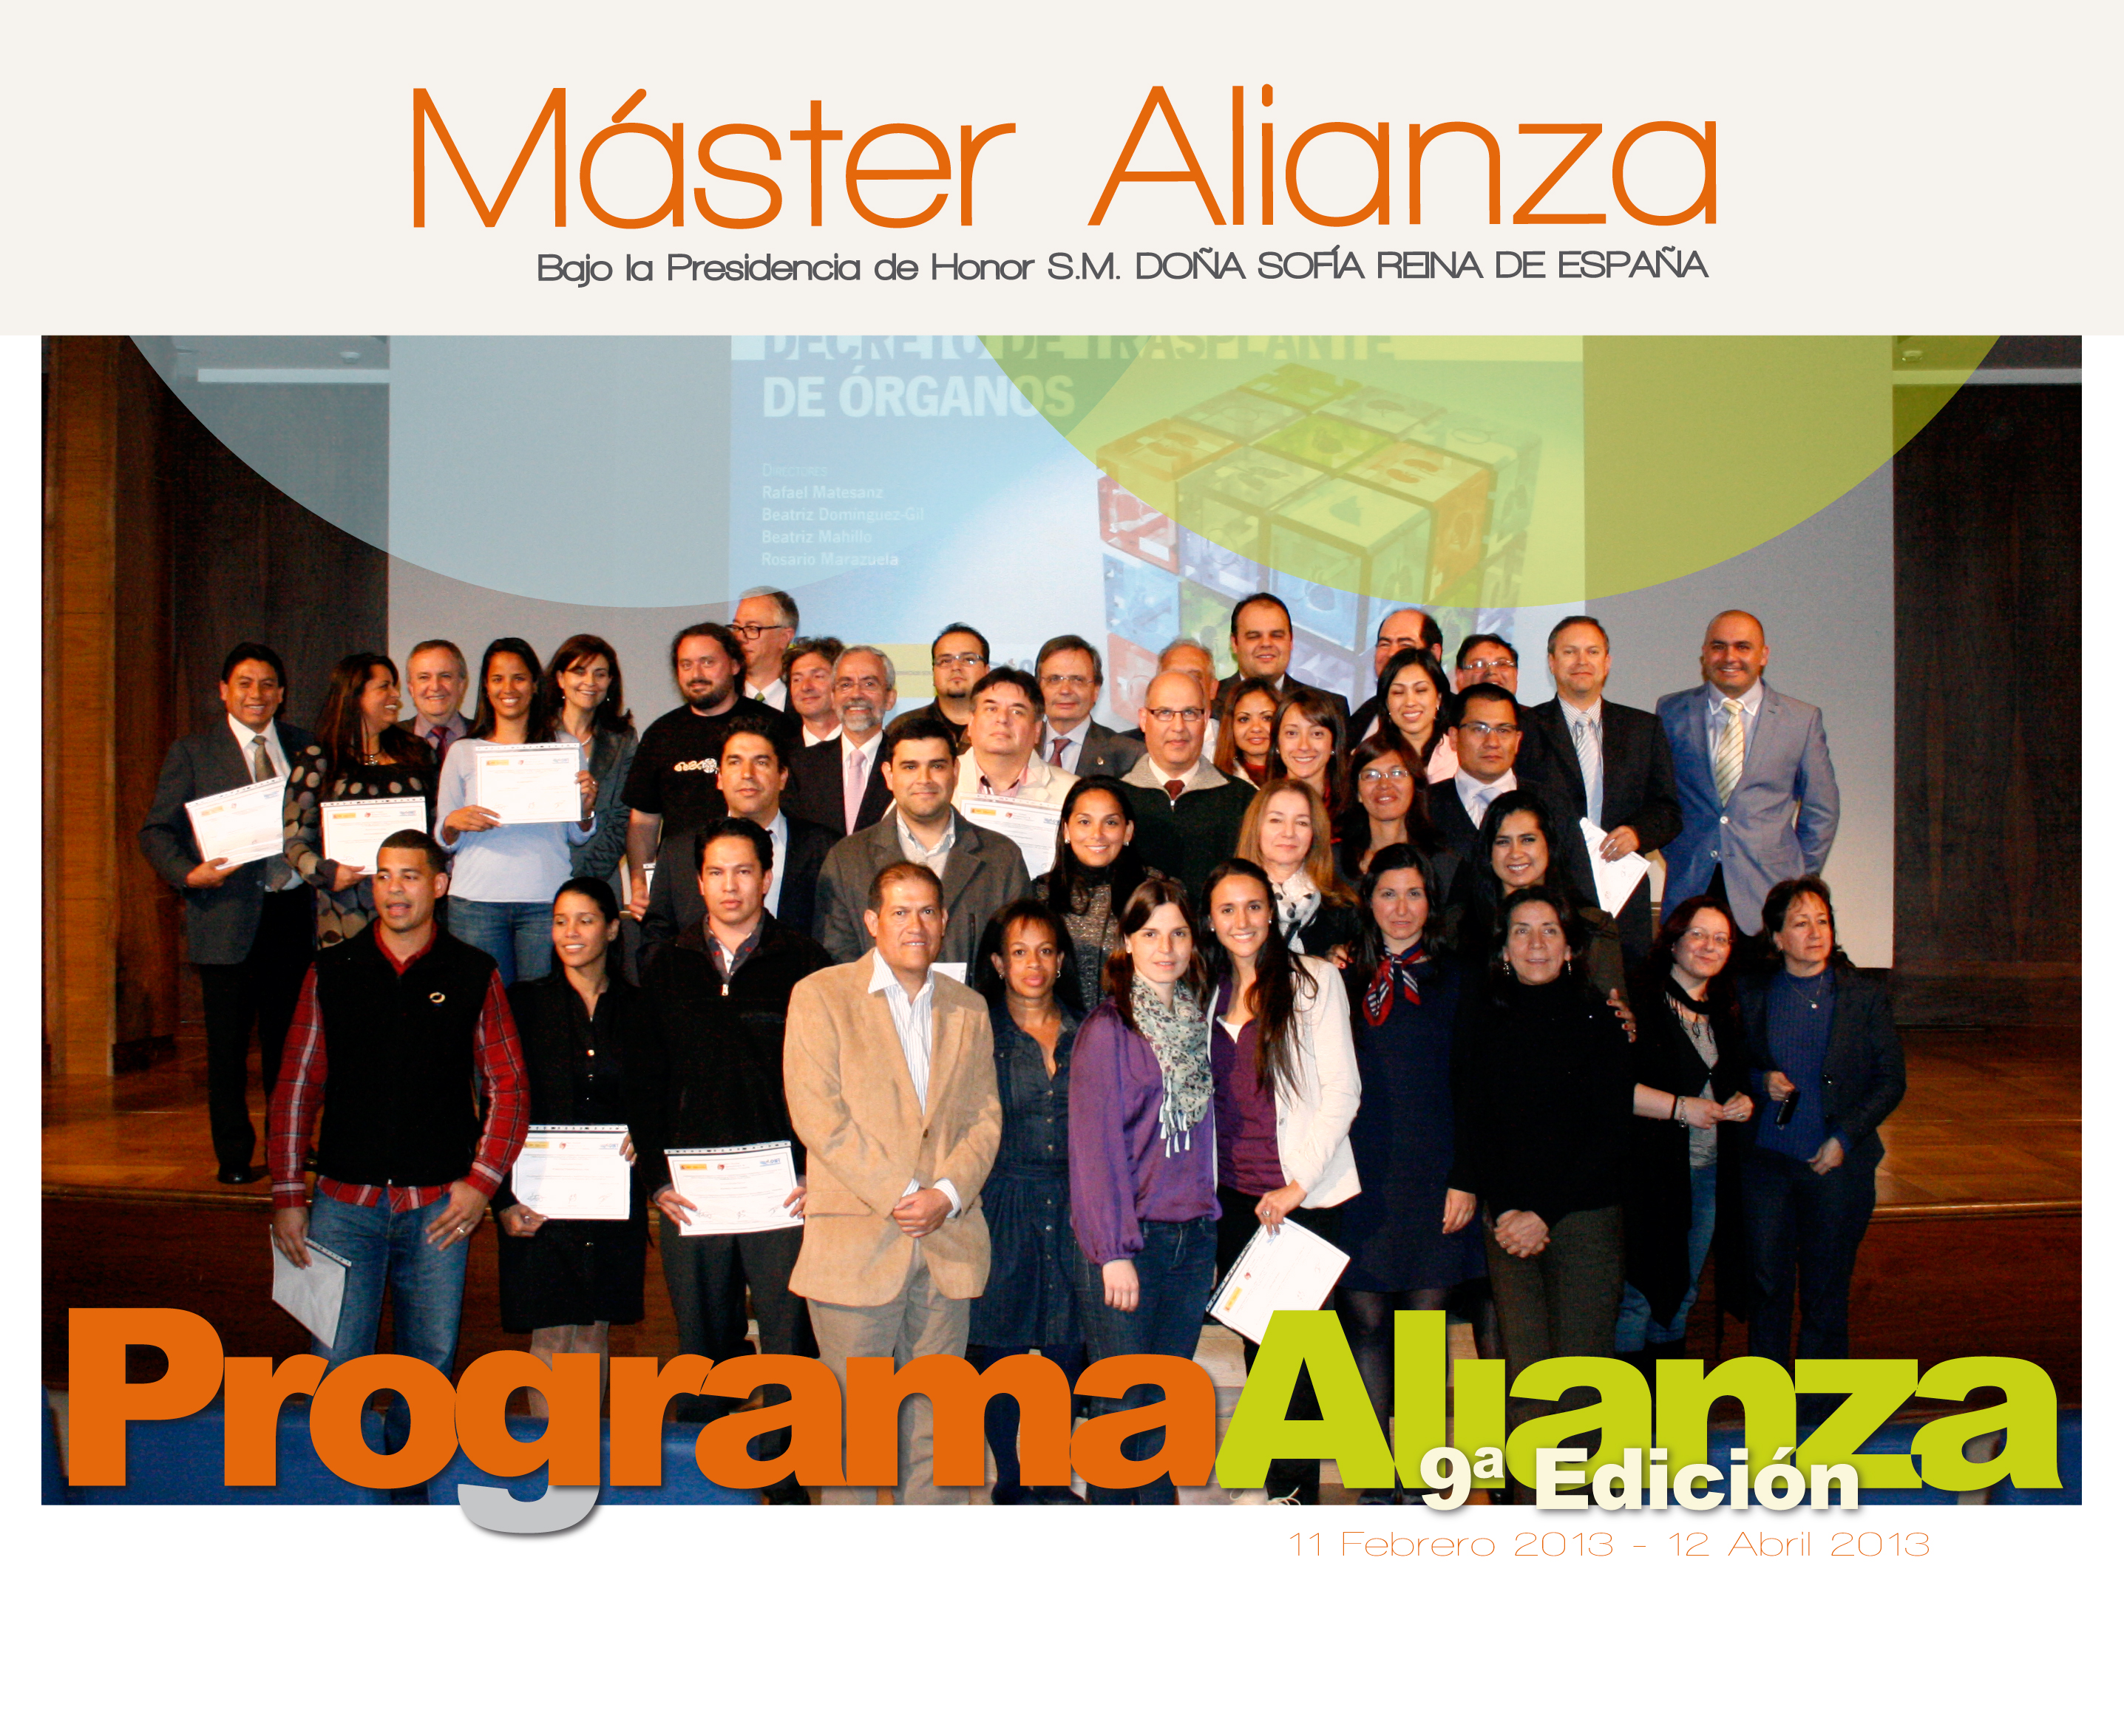 malianza-grupo2013